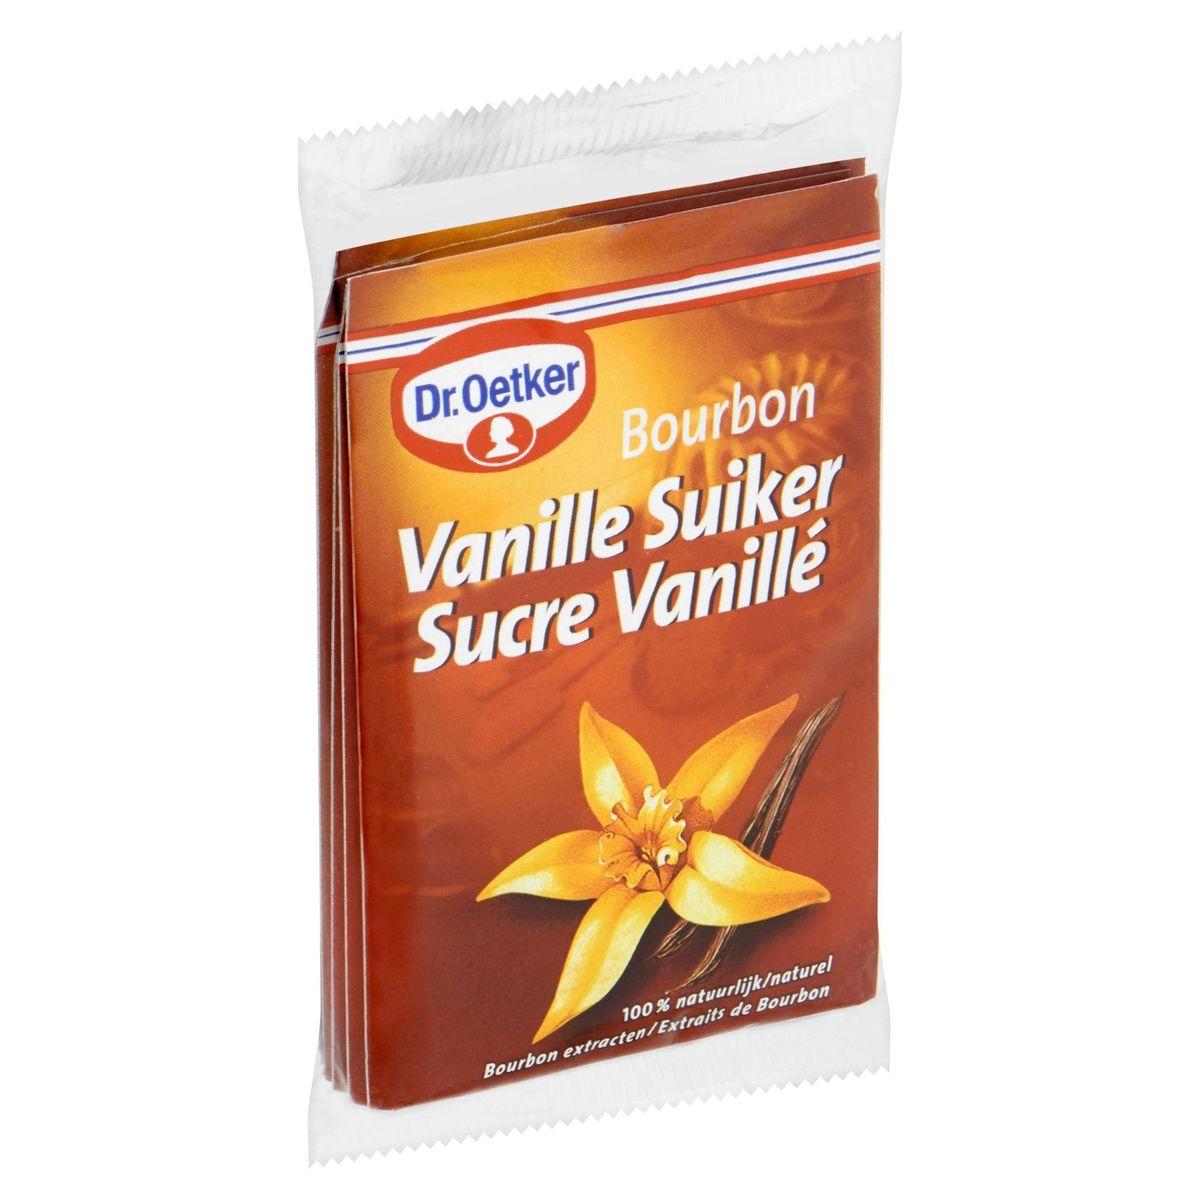 Dr. Oetker Sucre Vanille Bourbon 5 x 8 g